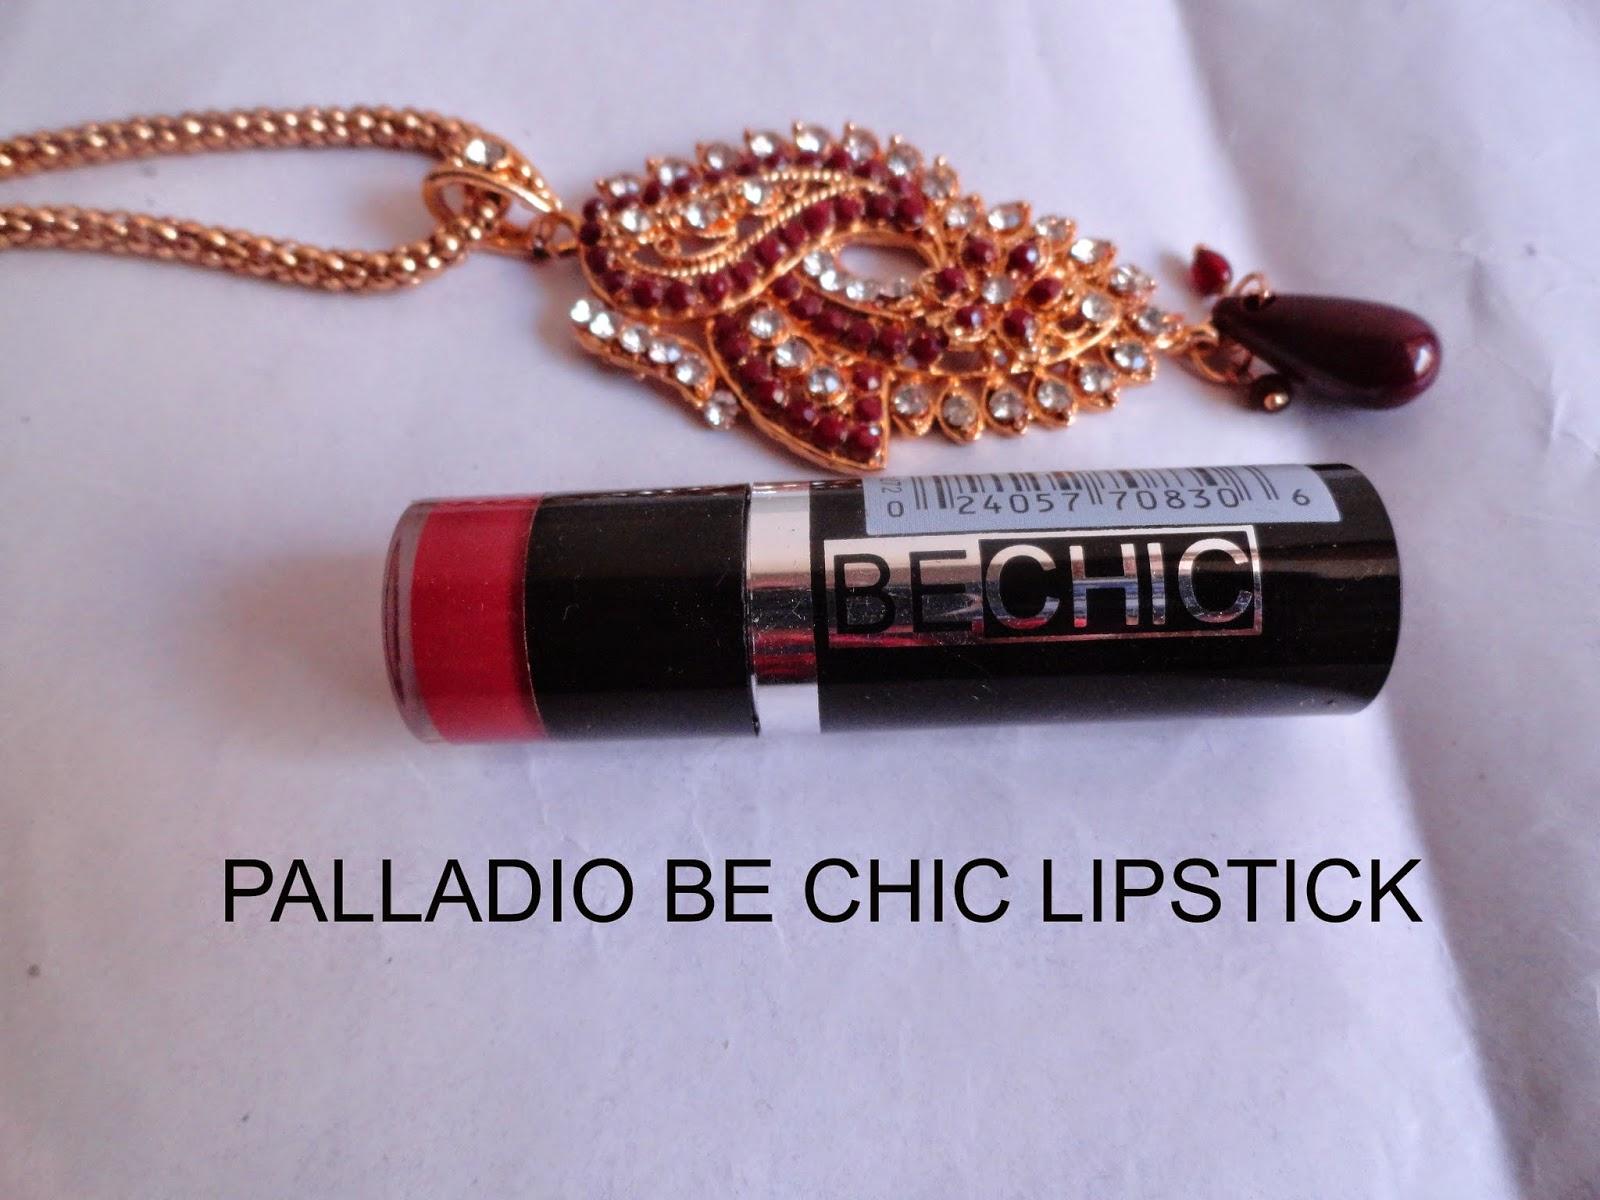 REVIEW: Palladio Be Chic Lipstick in Merlot. image